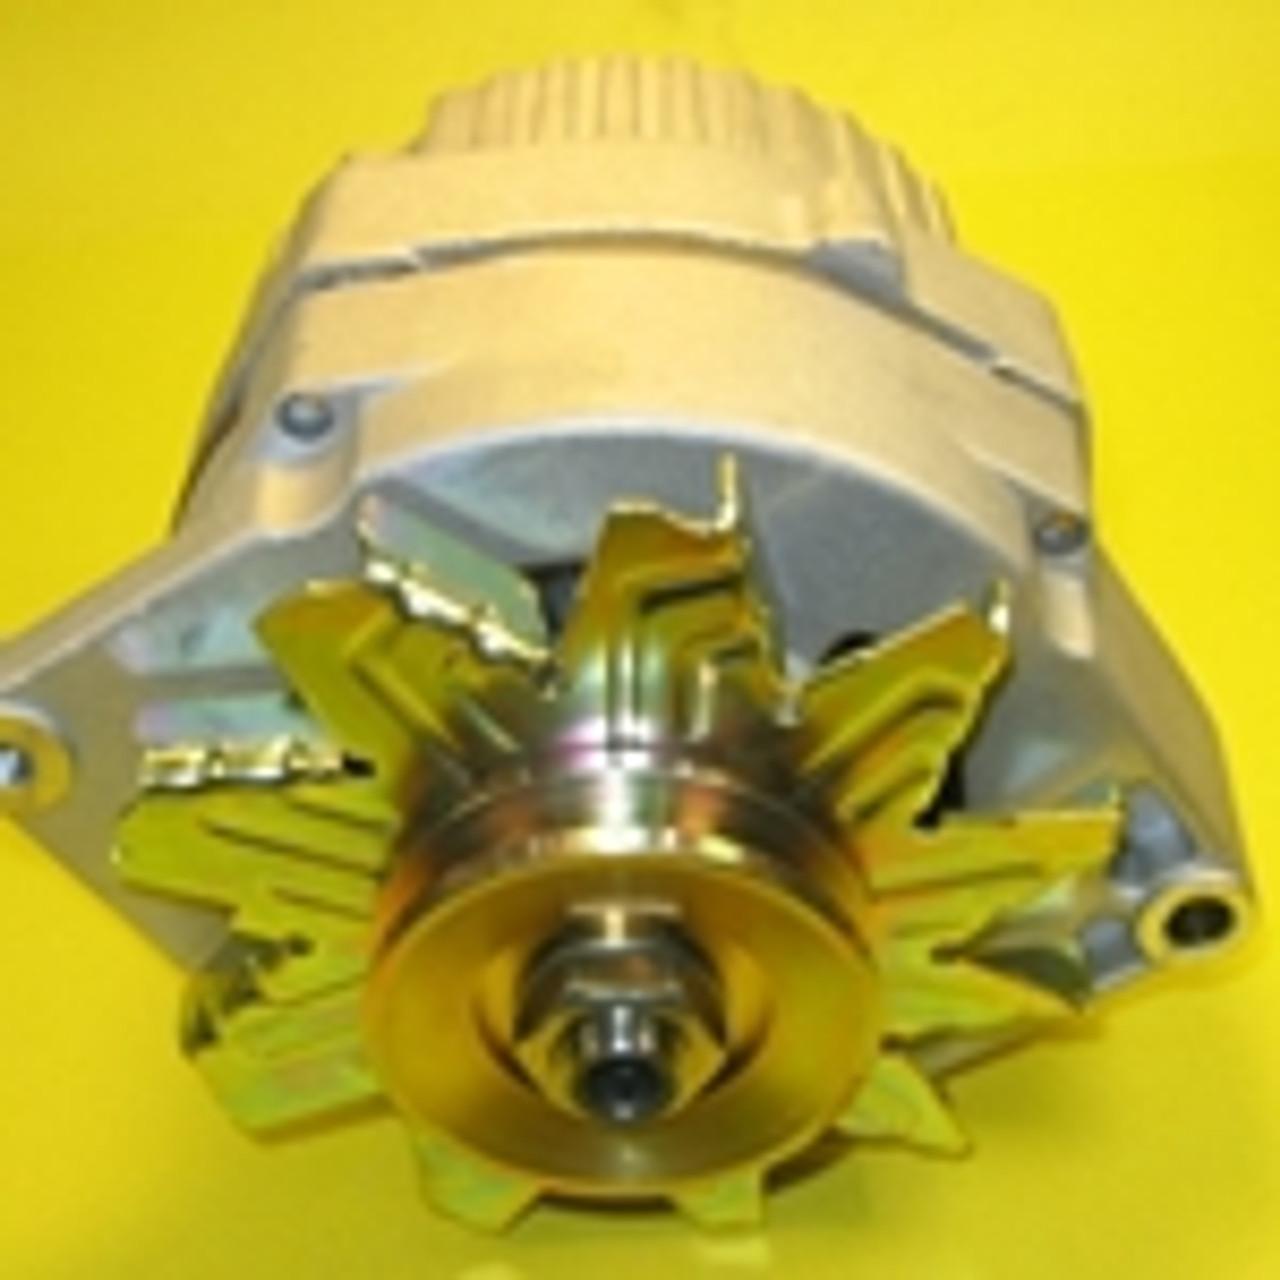 1-Wire Alternators